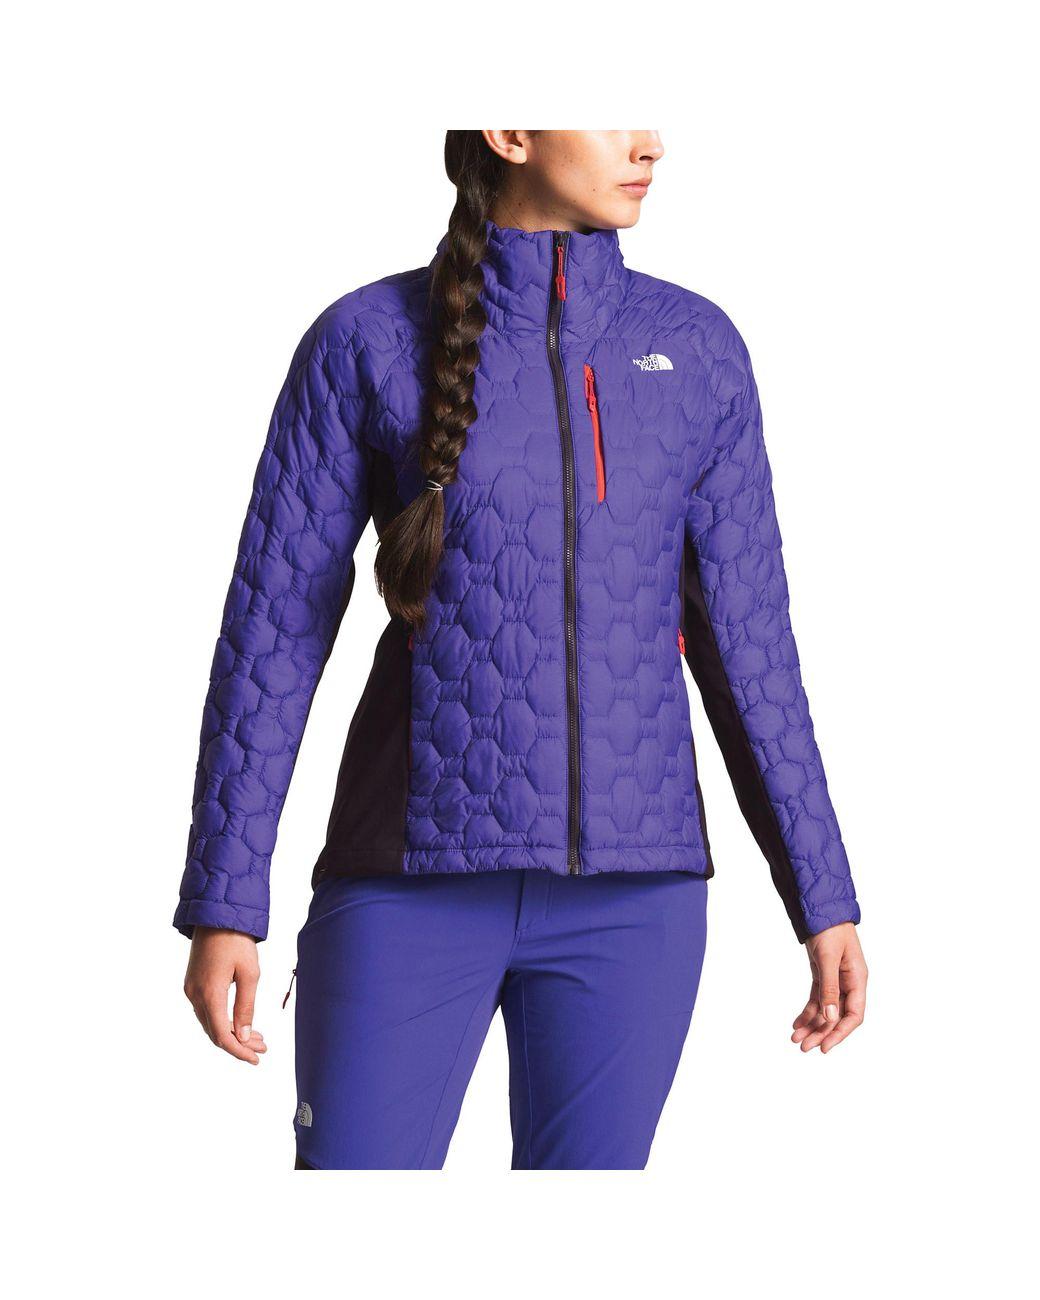 299450eb7 Women's Purple Impendor Thermoball Hybrid Jacket